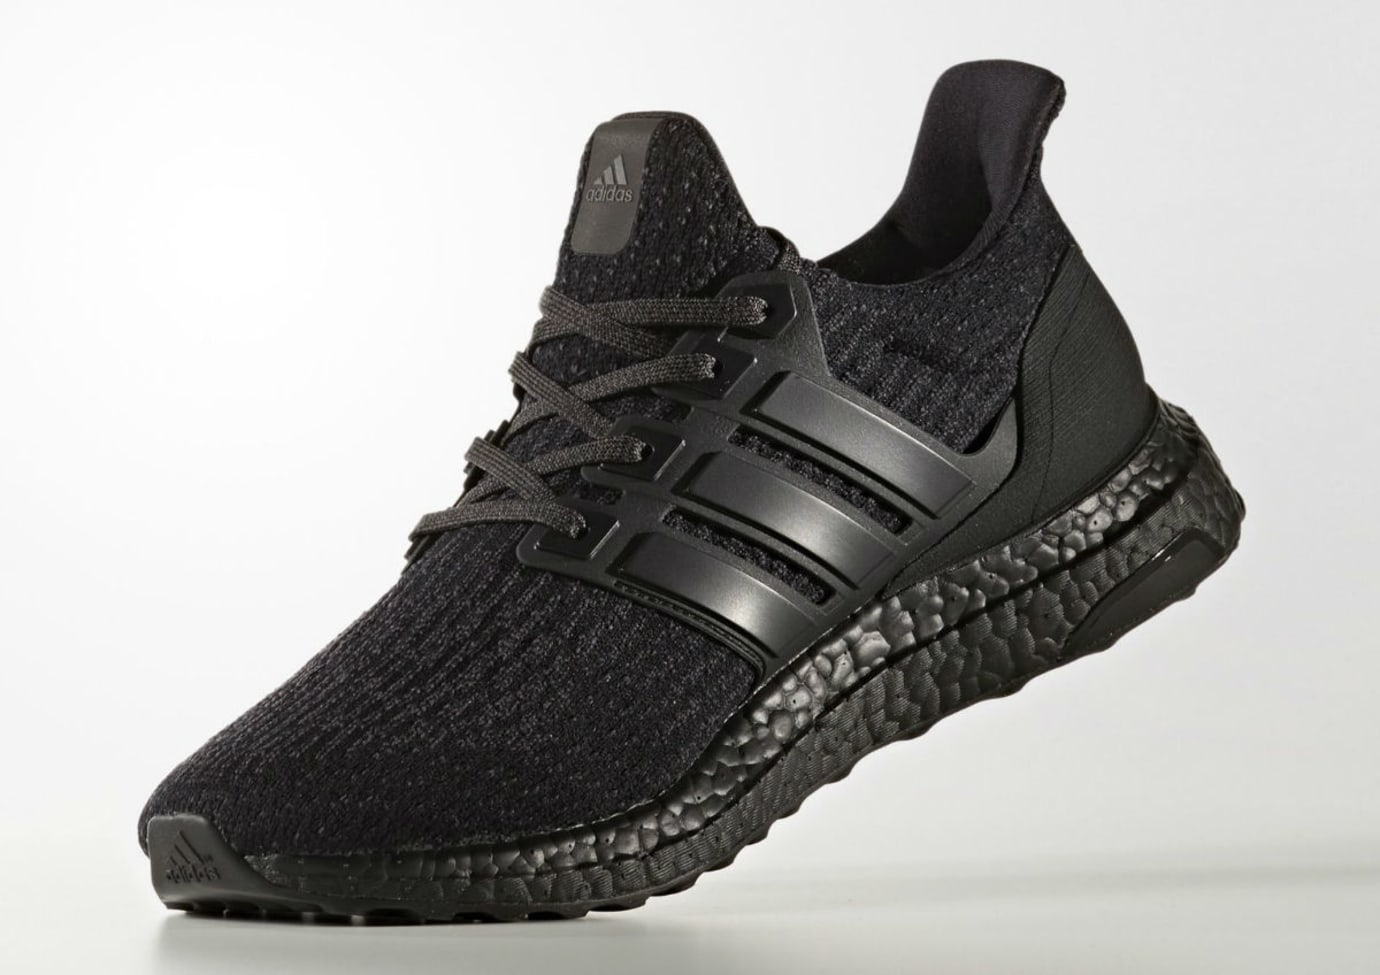 b85f1d1c7 Adidas Ultra Boost 3.0 Triple Black Release Date CG3038